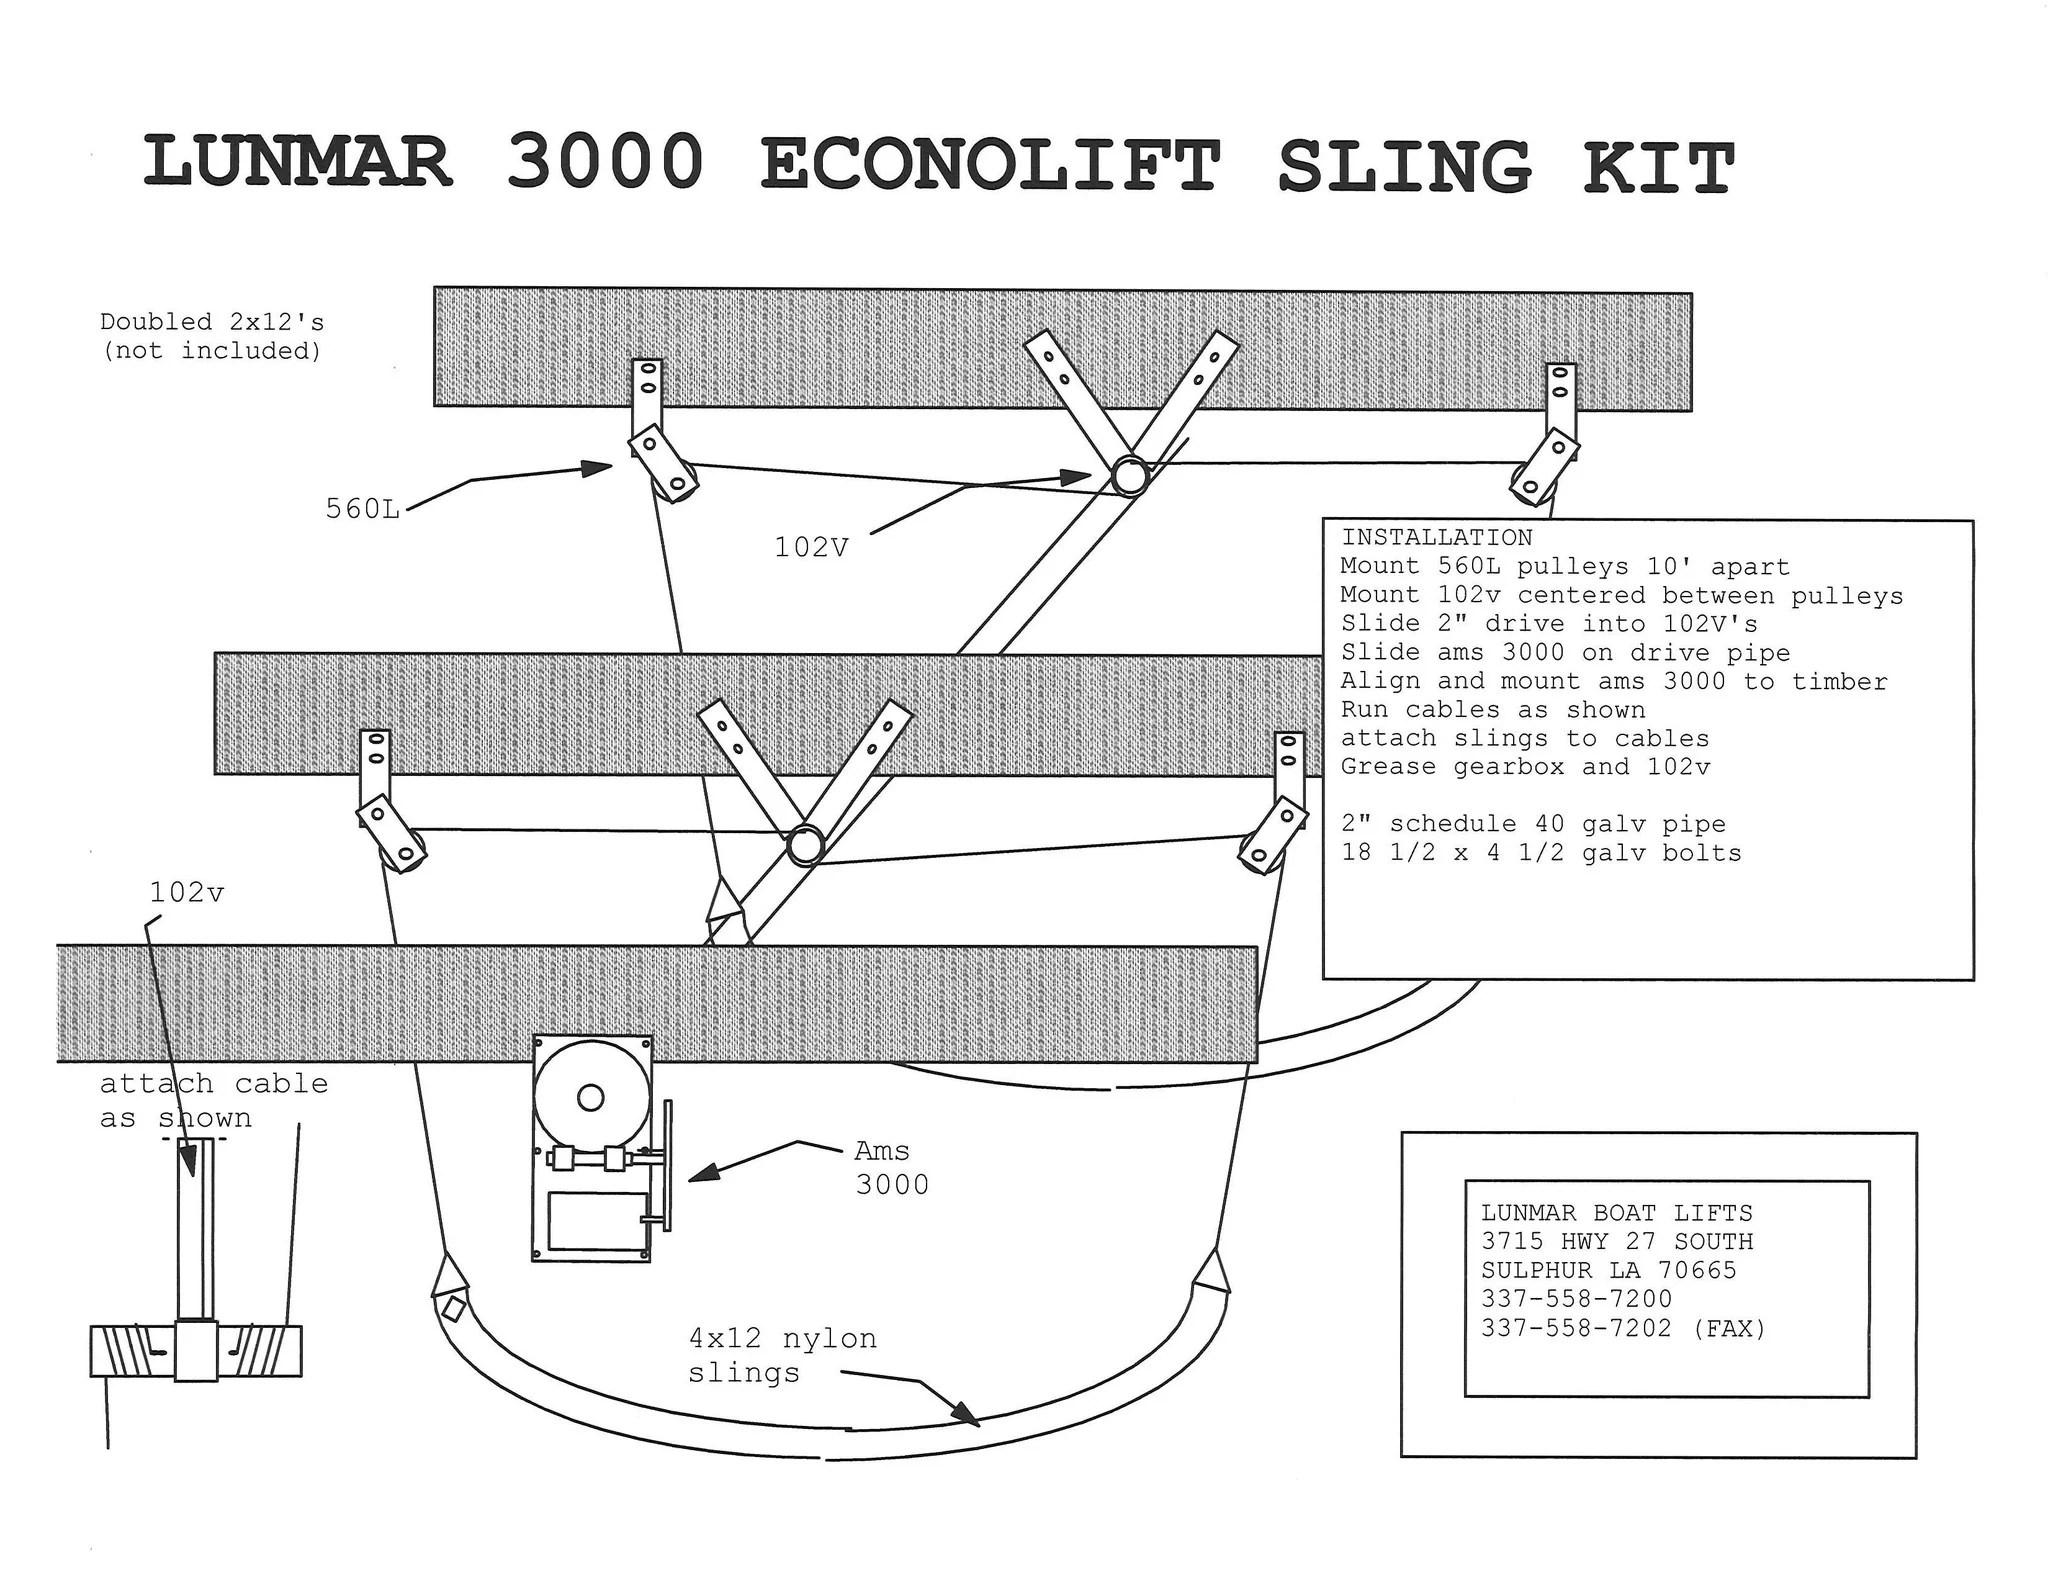 3000_Econo_Installation_Diagram?resize=665%2C514&ssl=1 salzer boat lift switch wiring diagram wiring diagram salzer boat lift switch wiring diagram at alyssarenee.co